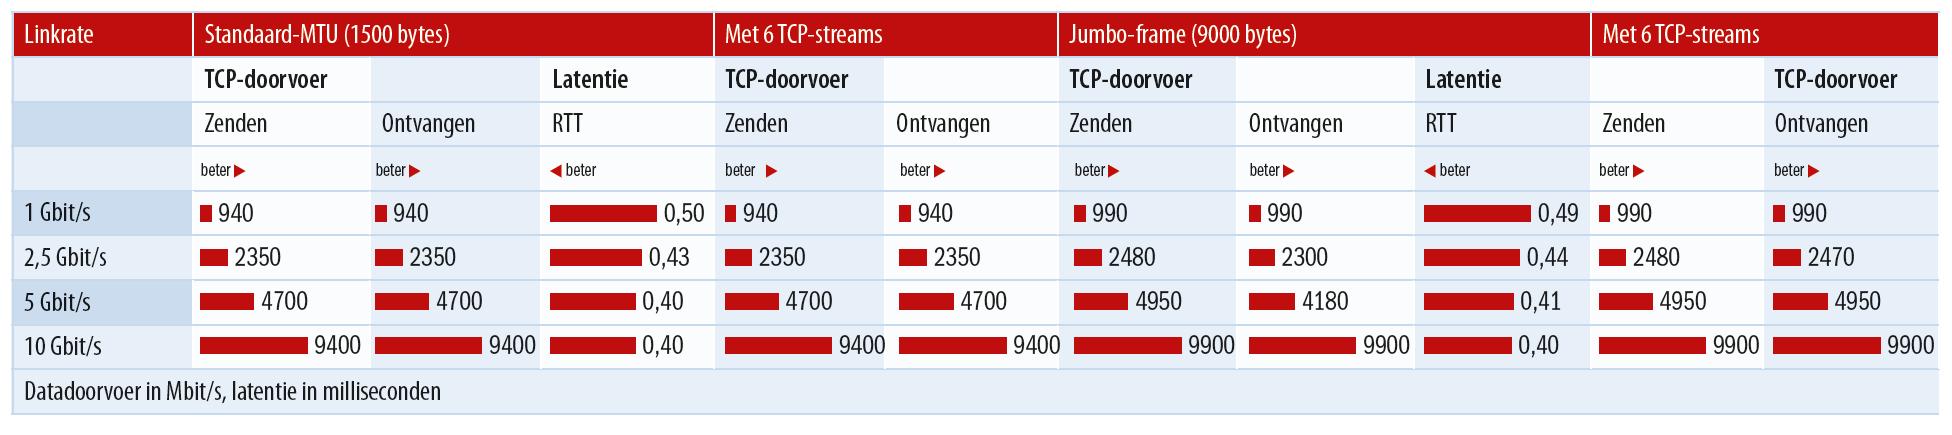 NBase-T snelheden praktijk 1 2,5 5 10 Gbit